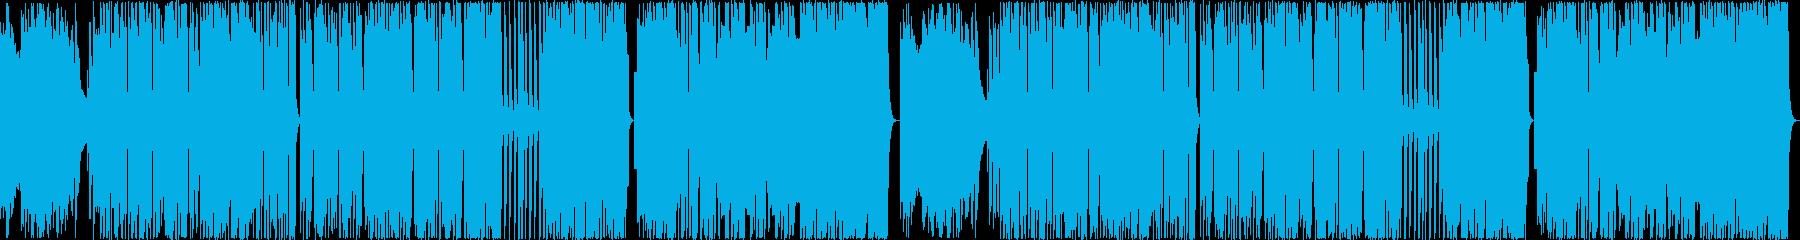 8bit:熱い:男:戦い【ループ】の再生済みの波形